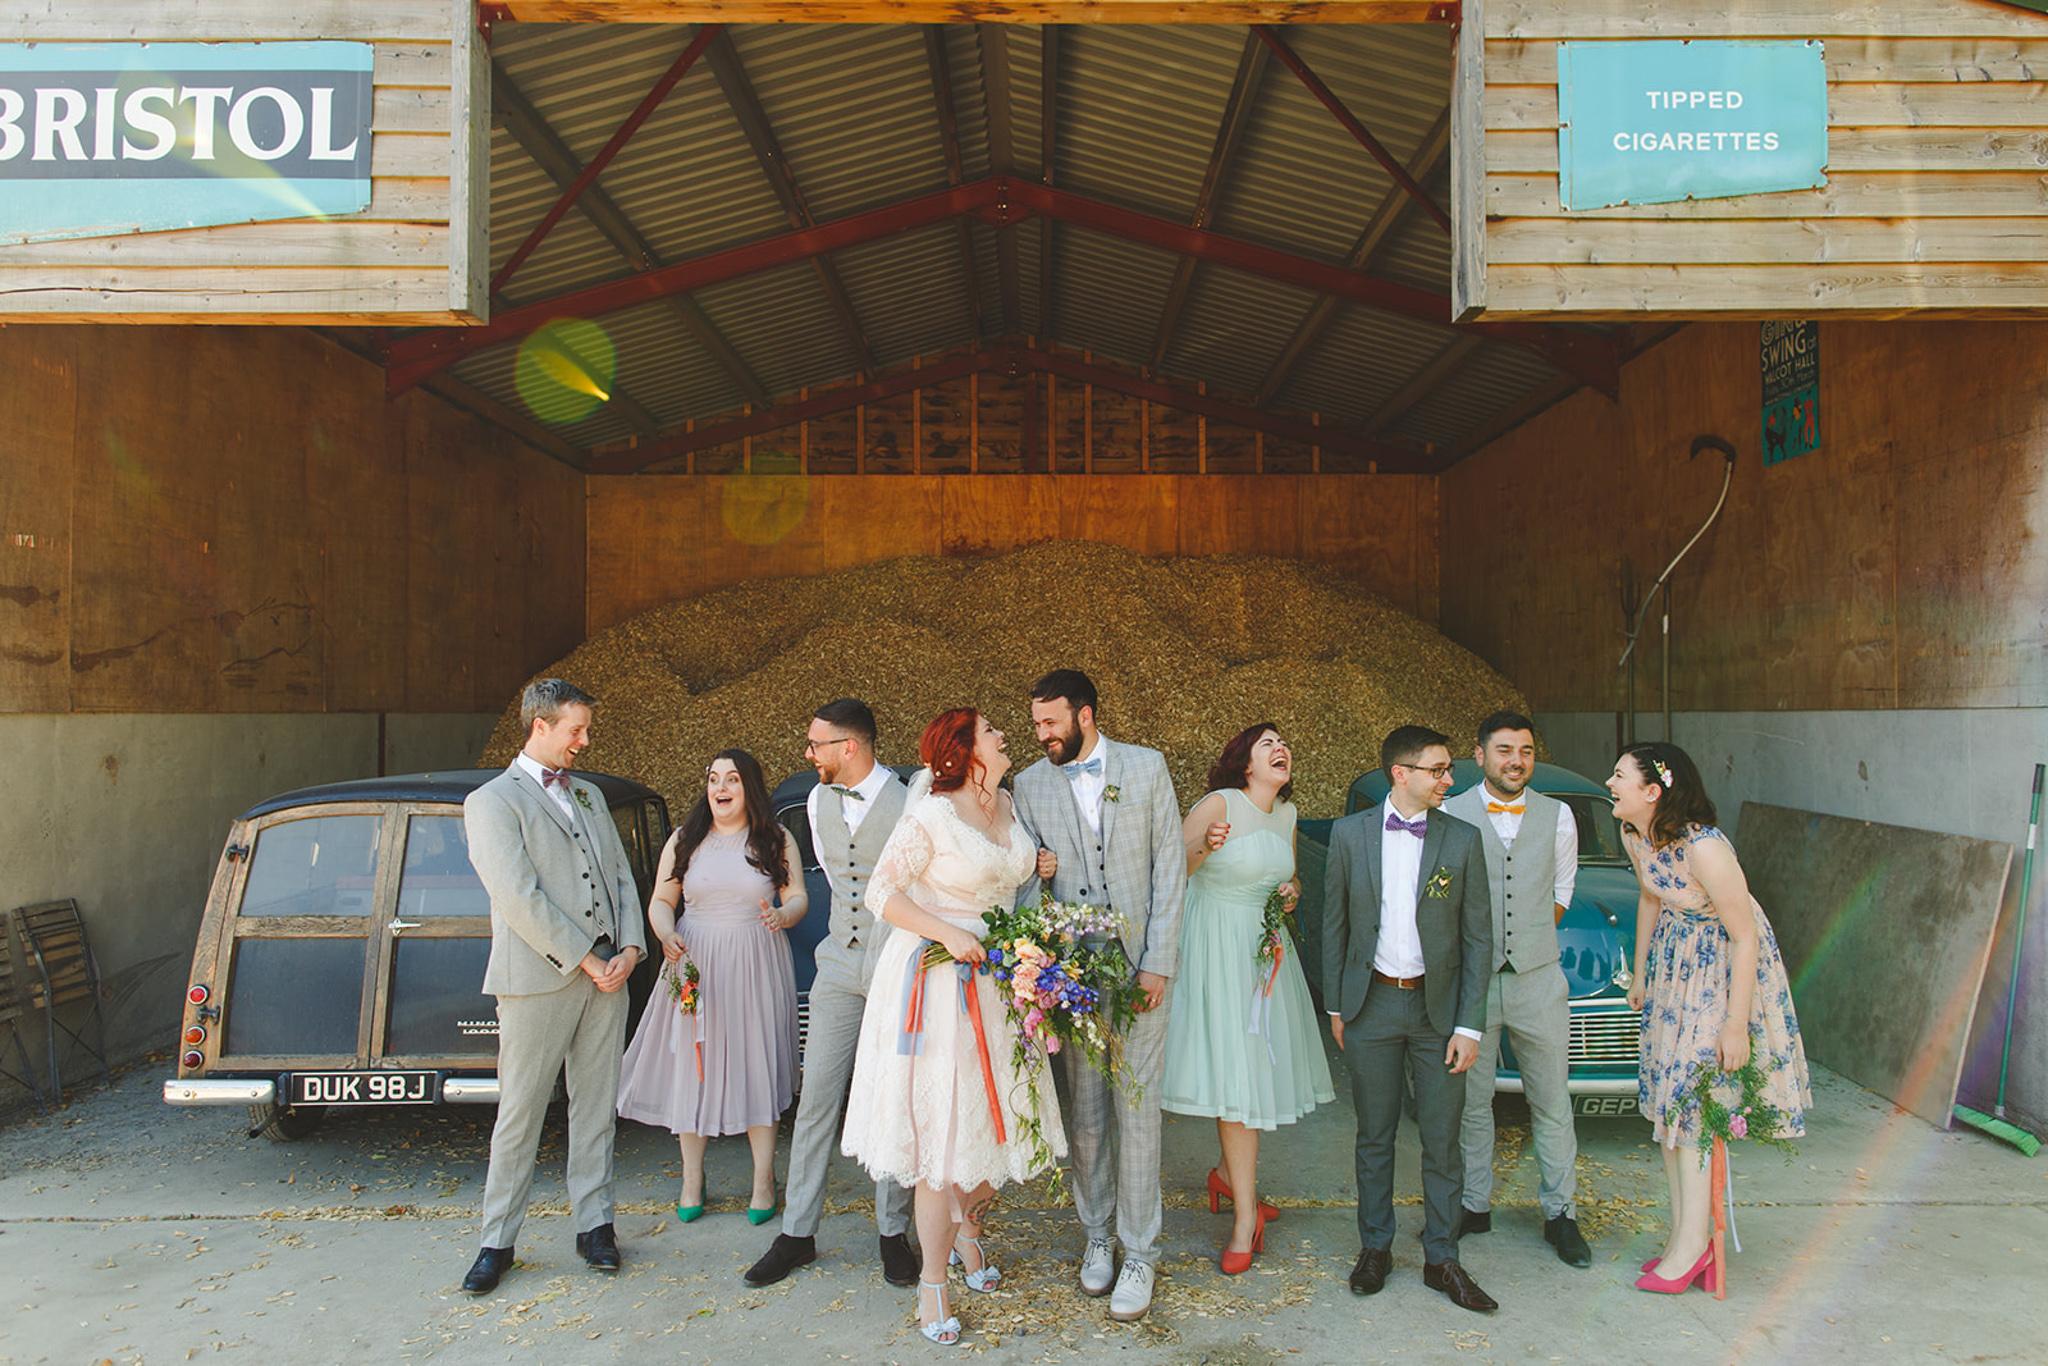 derbyshire-wedding-photographer-videographer-camera-hannah-22.jpg